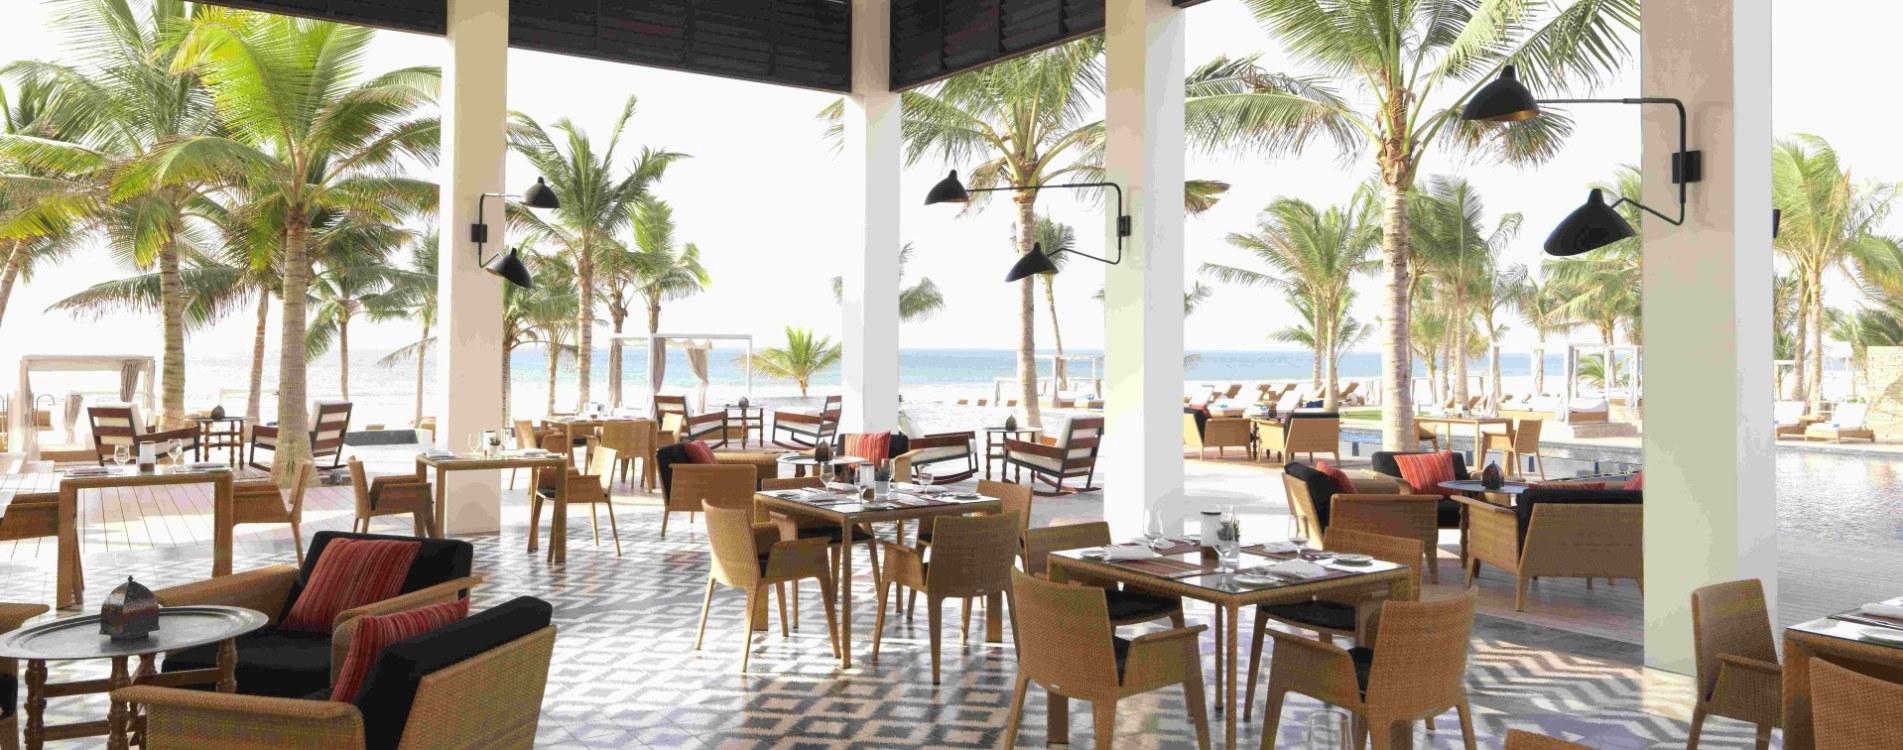 Al-Baleed-Resort-Salalah-By-Anantara-Al- Mina-Terrasse-Vormittag-Oman.jpg